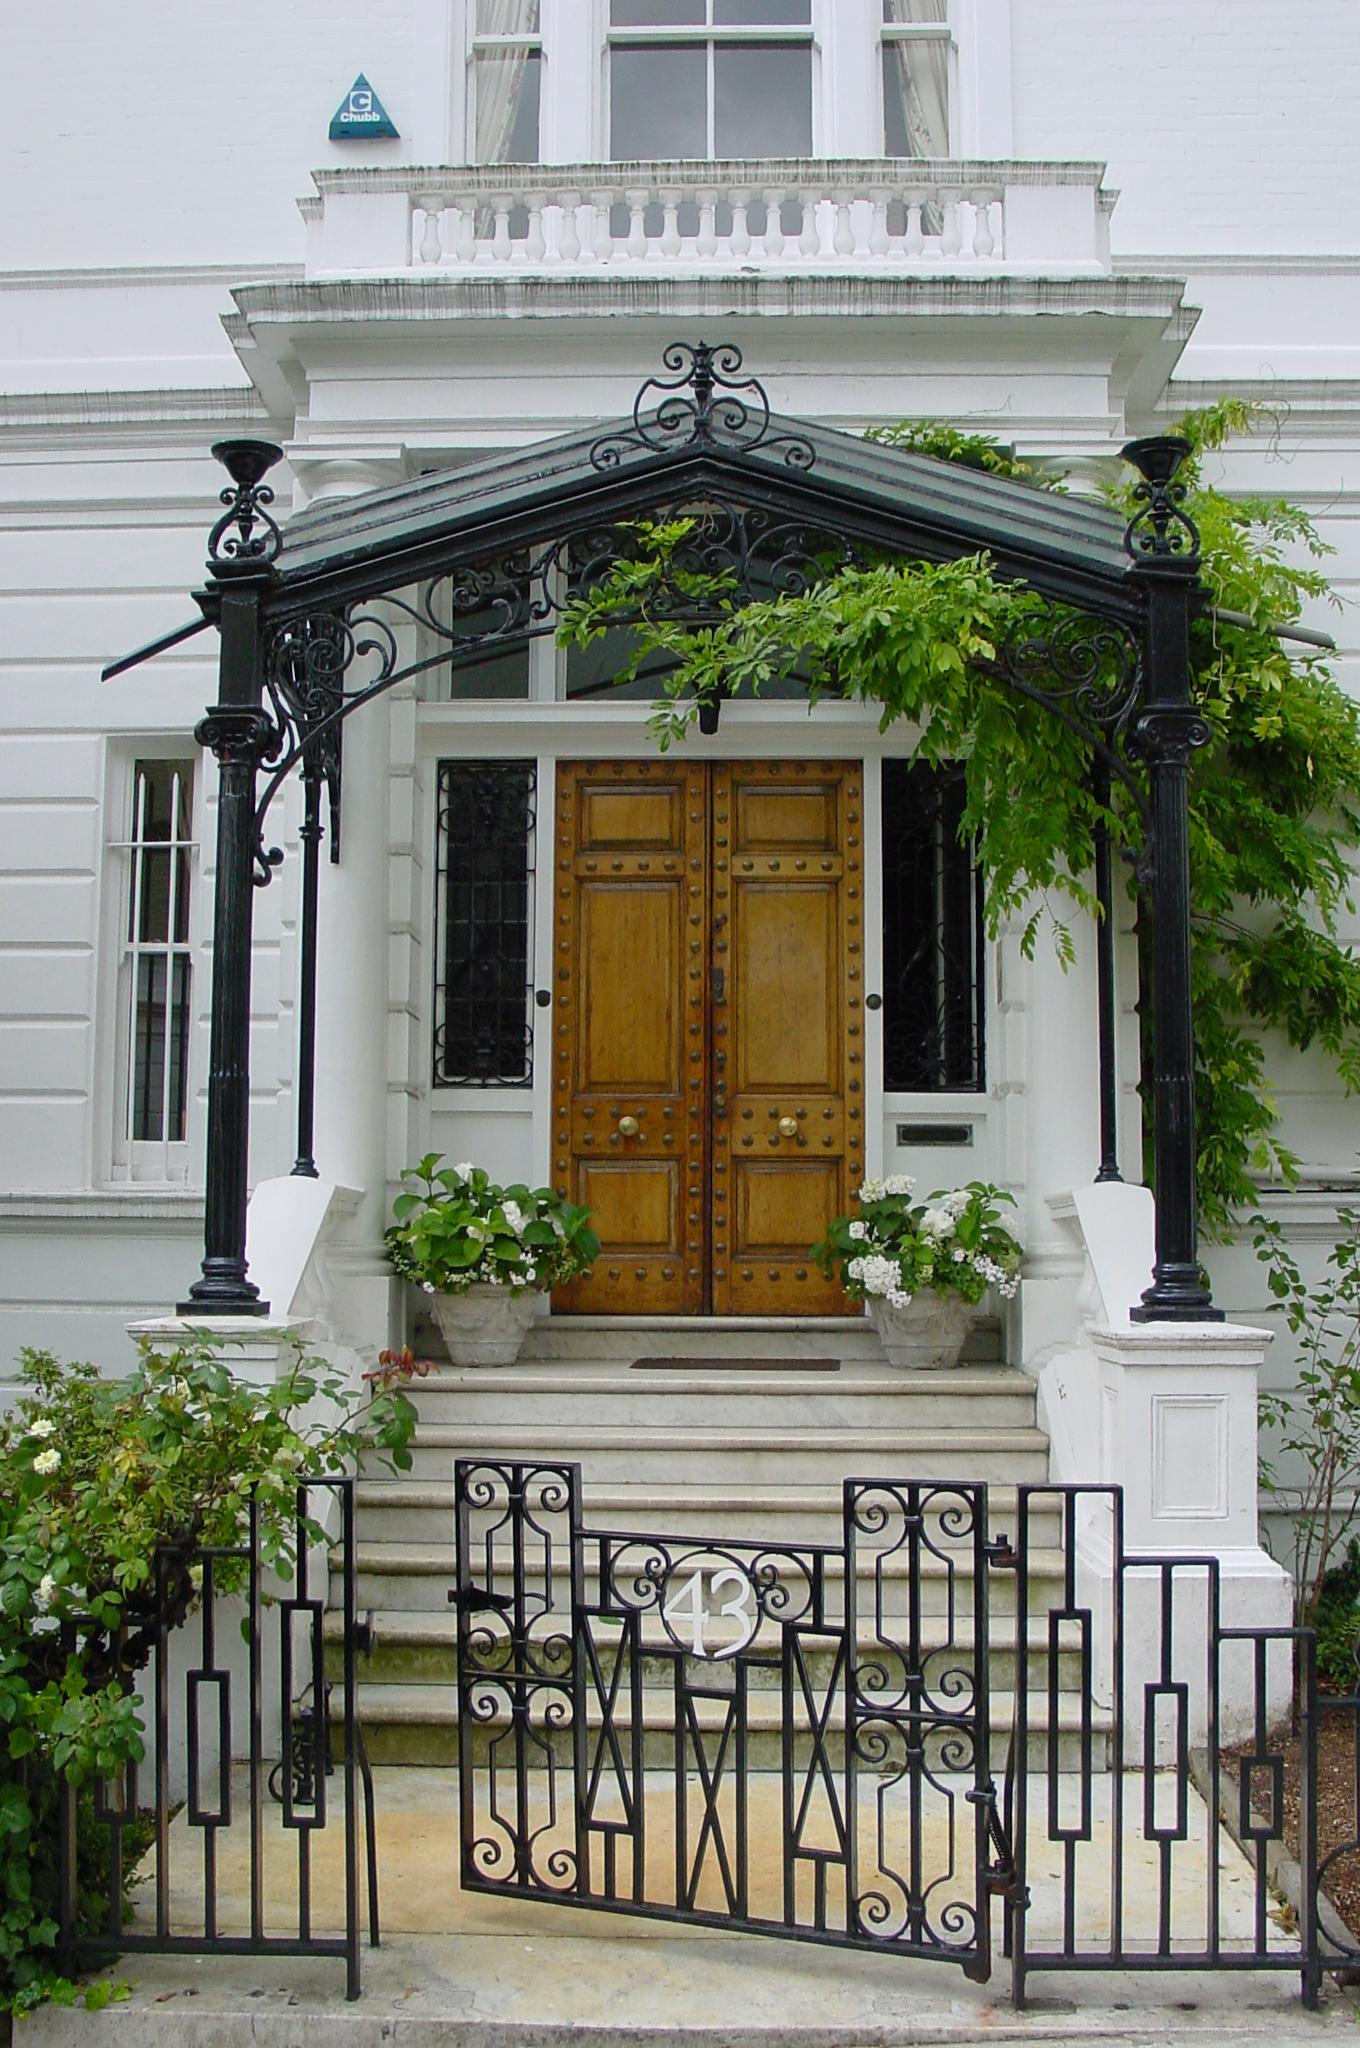 Philimore Gardens, Kensington